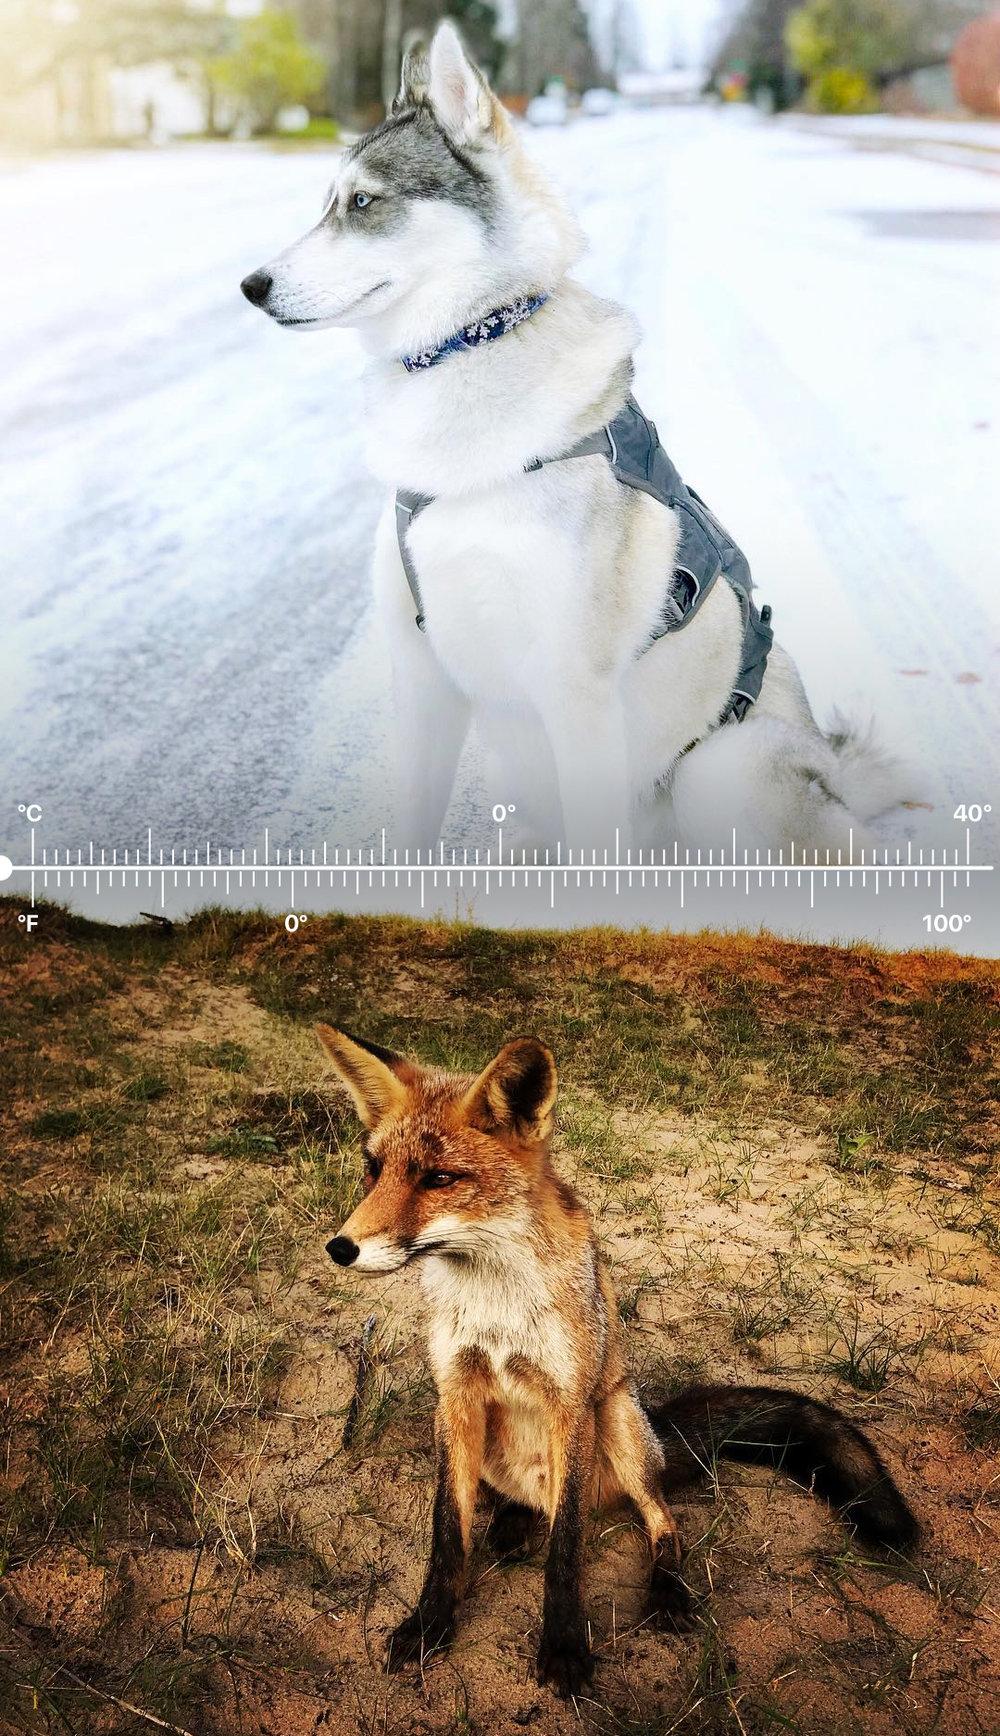 Temperatures_Story_r6b_03.jpg